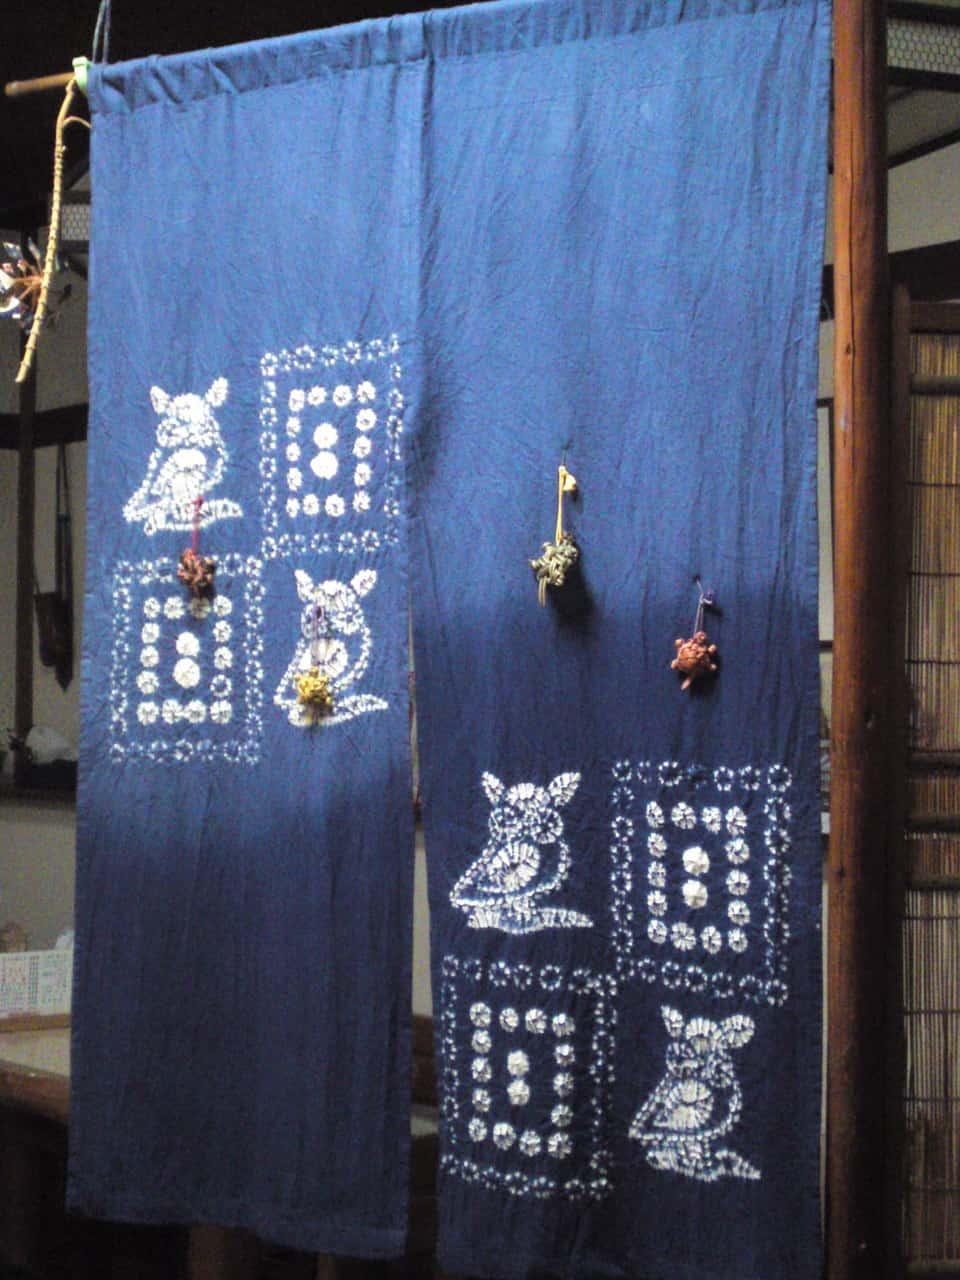 Art,shop,souvenir,curtain,noren,pattern,traditional,izakaya